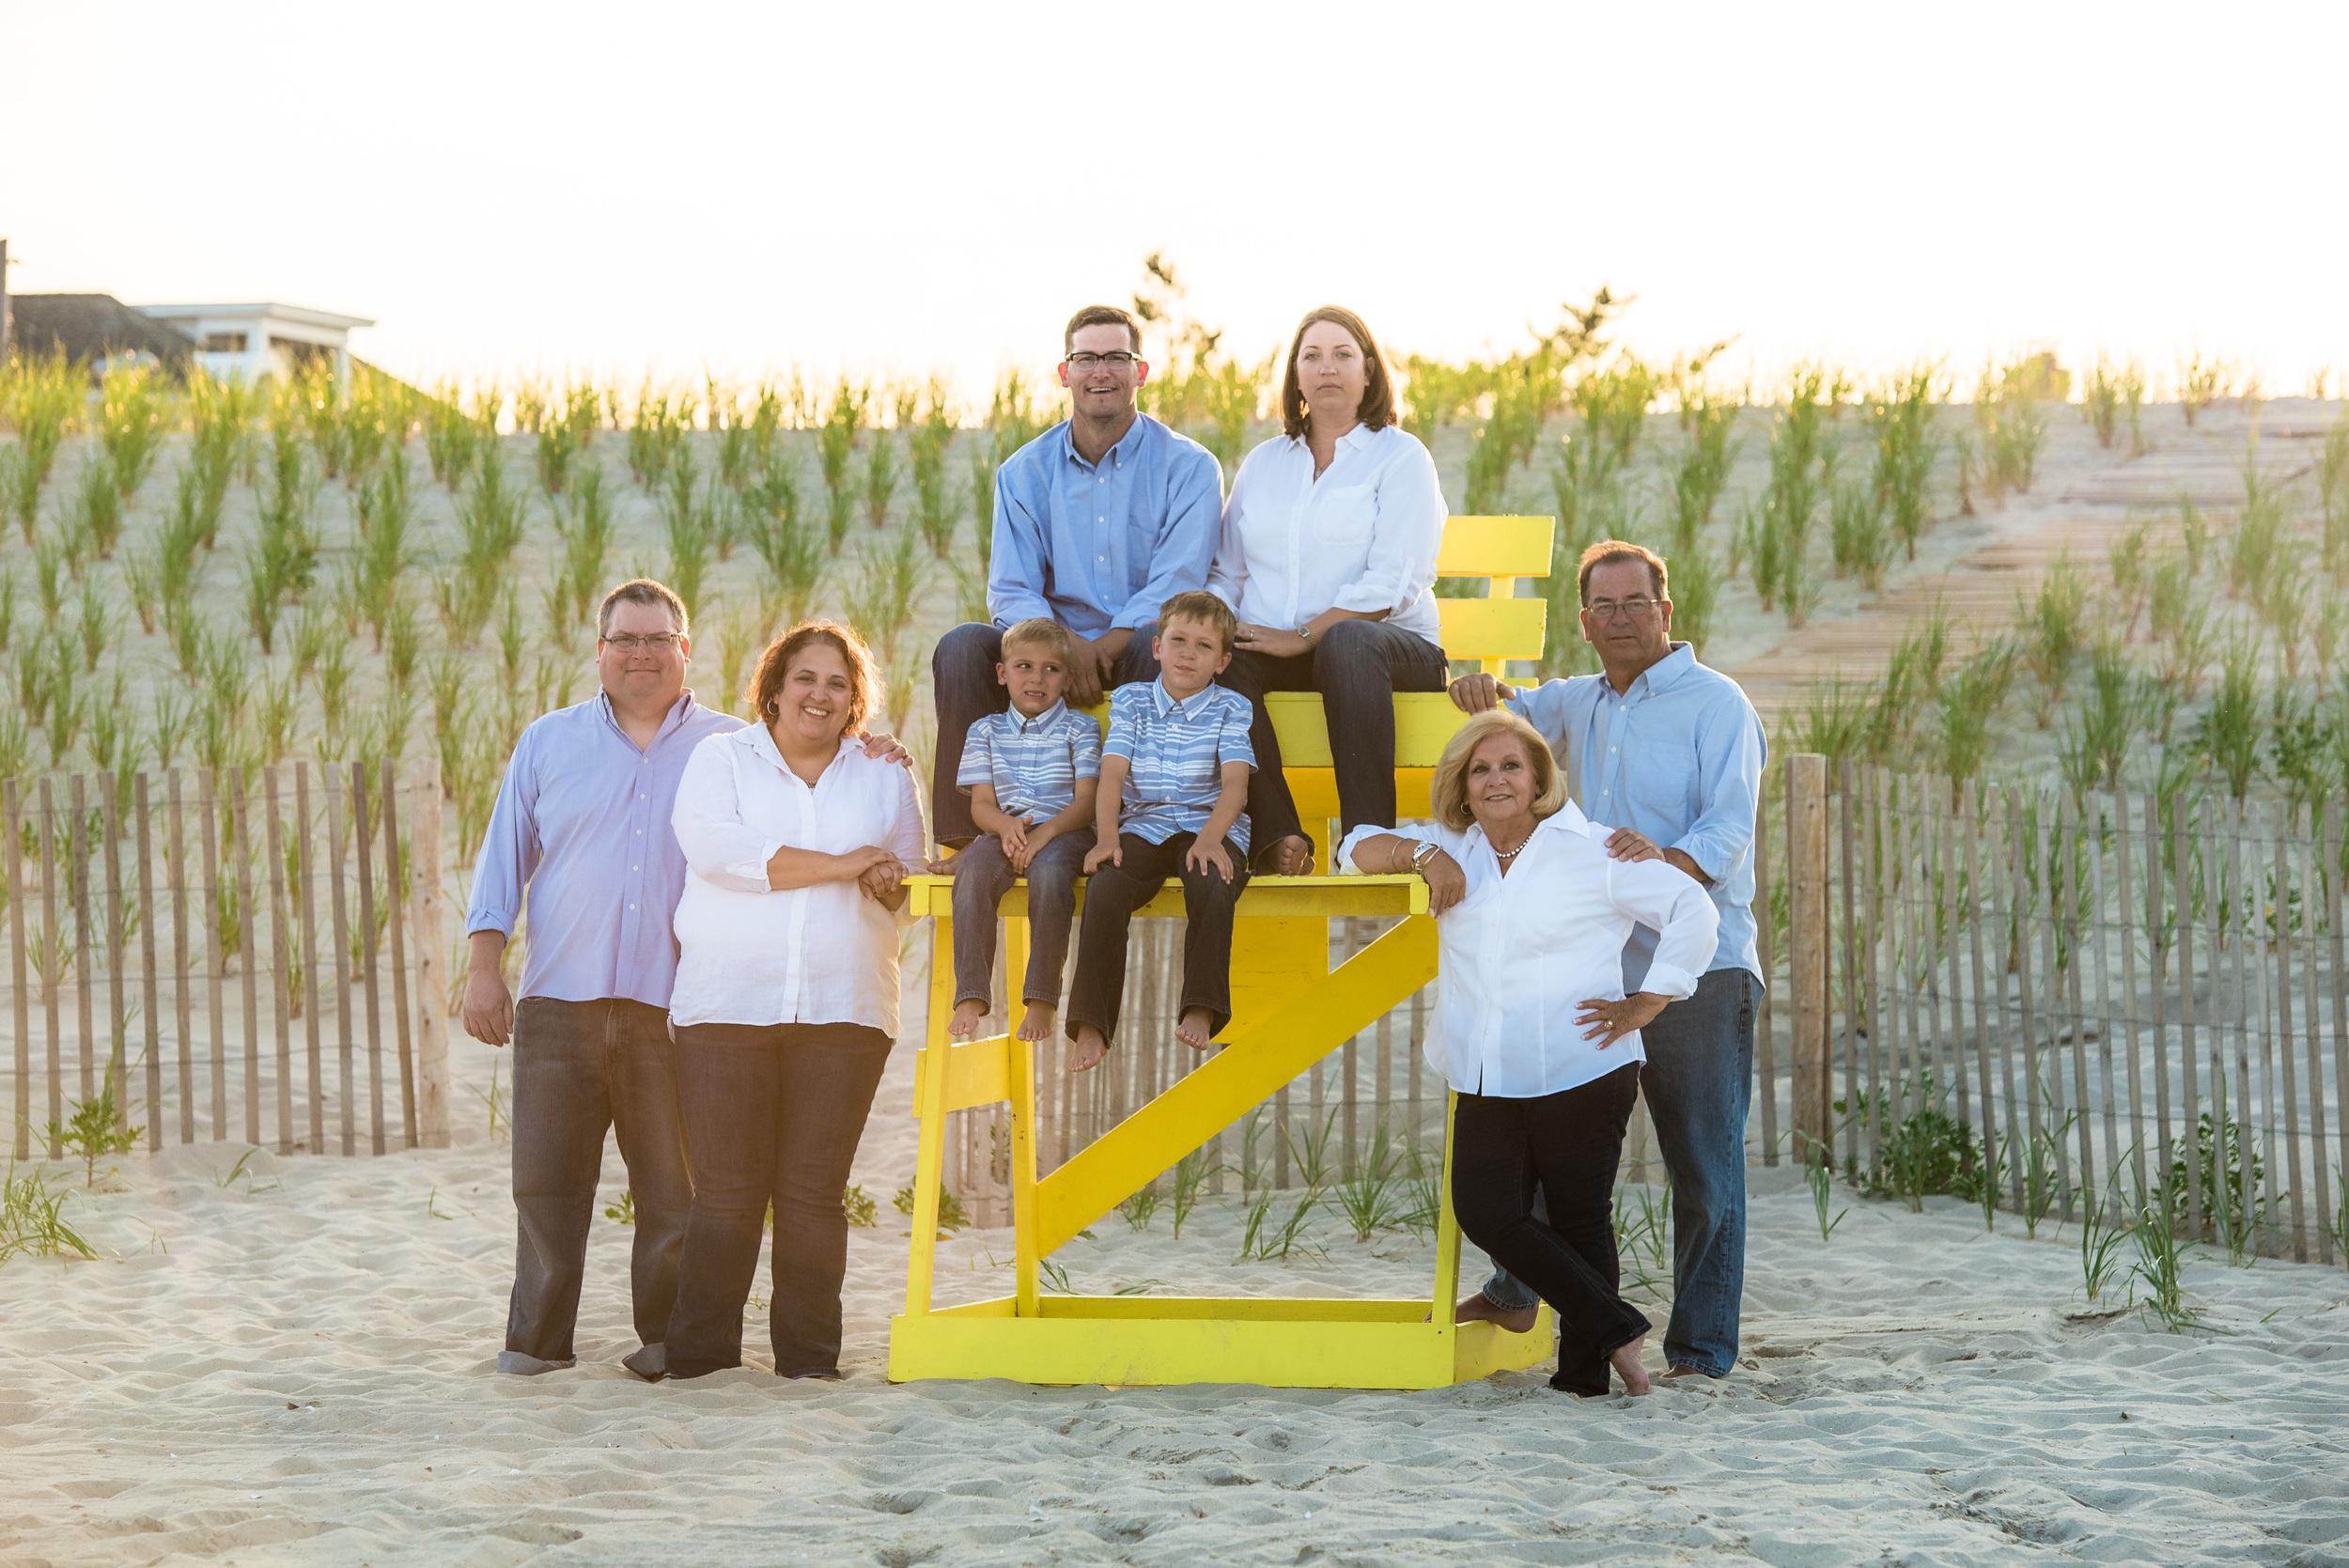 Long Beach Island Family Portraits, Dombrowski 7